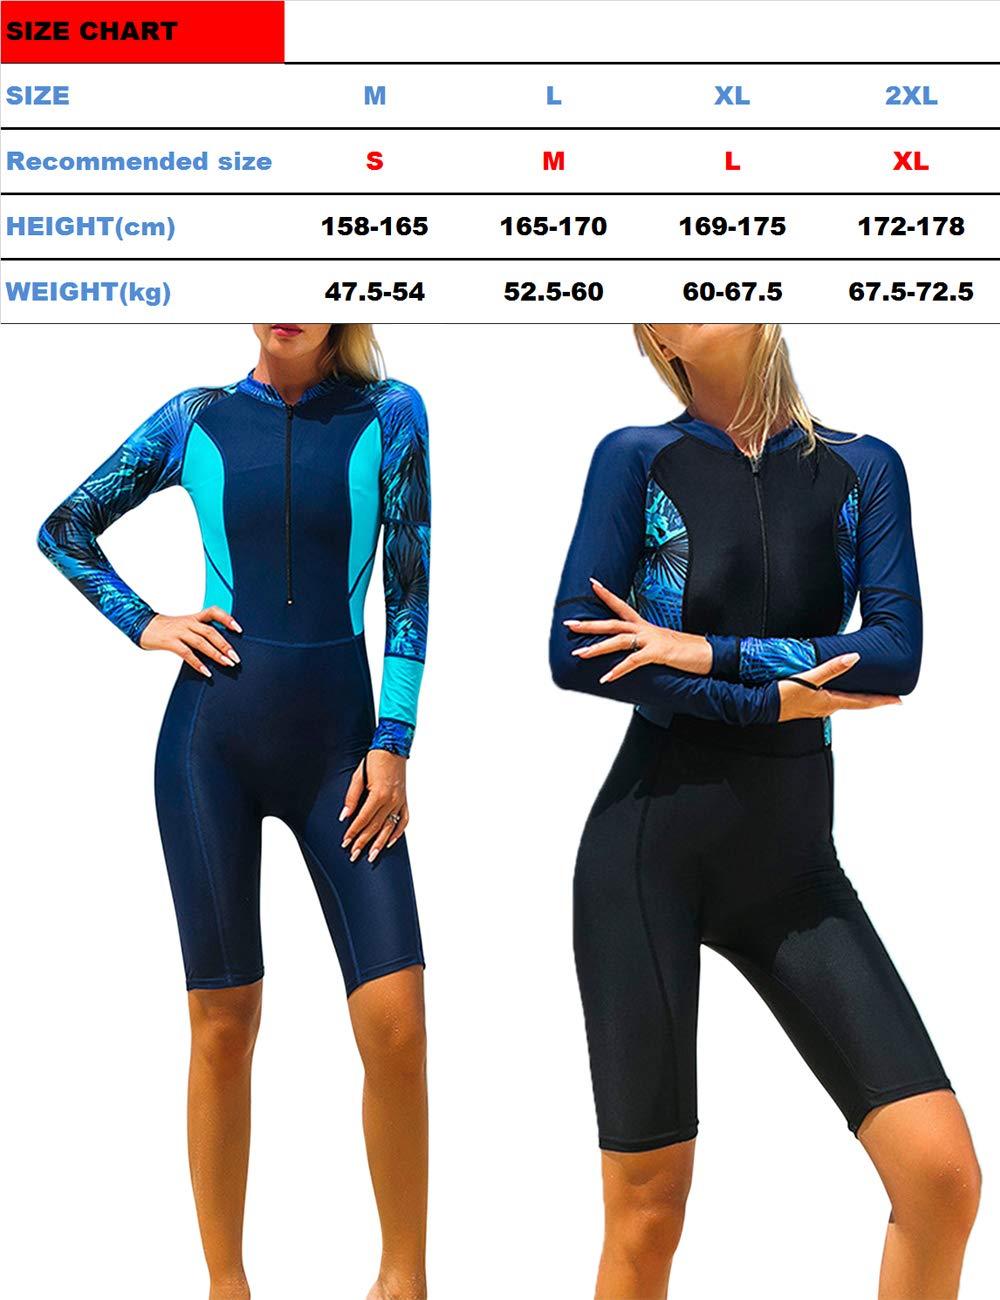 besbomig Traje de Surf para Mujer Full Body Wetsuit Traje de Buceo Manga Larga Playa Anti-UV Quick Drying Traje de ba/ño Snorkeling Buceo